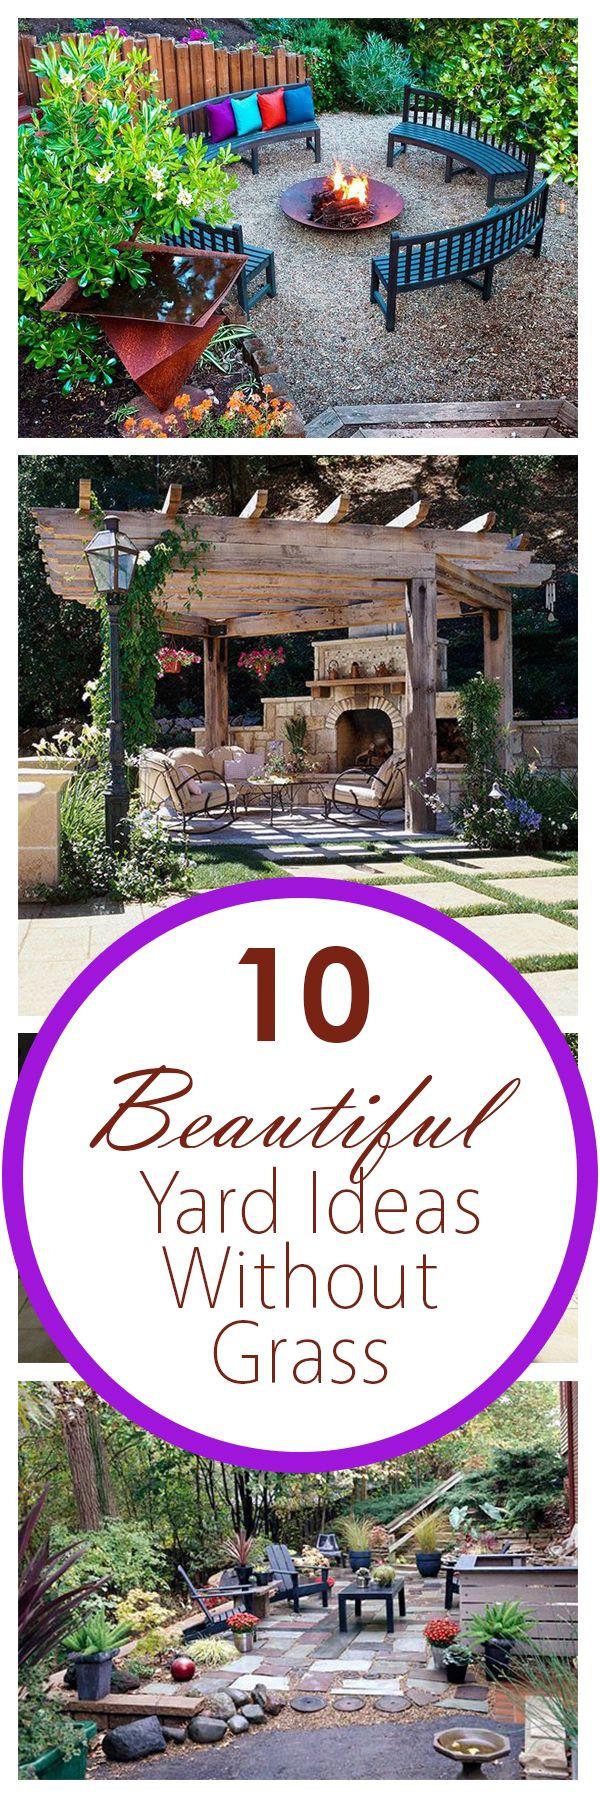 10 Beautiful Yard Ideas Without Grass | Outdoor gardens ...